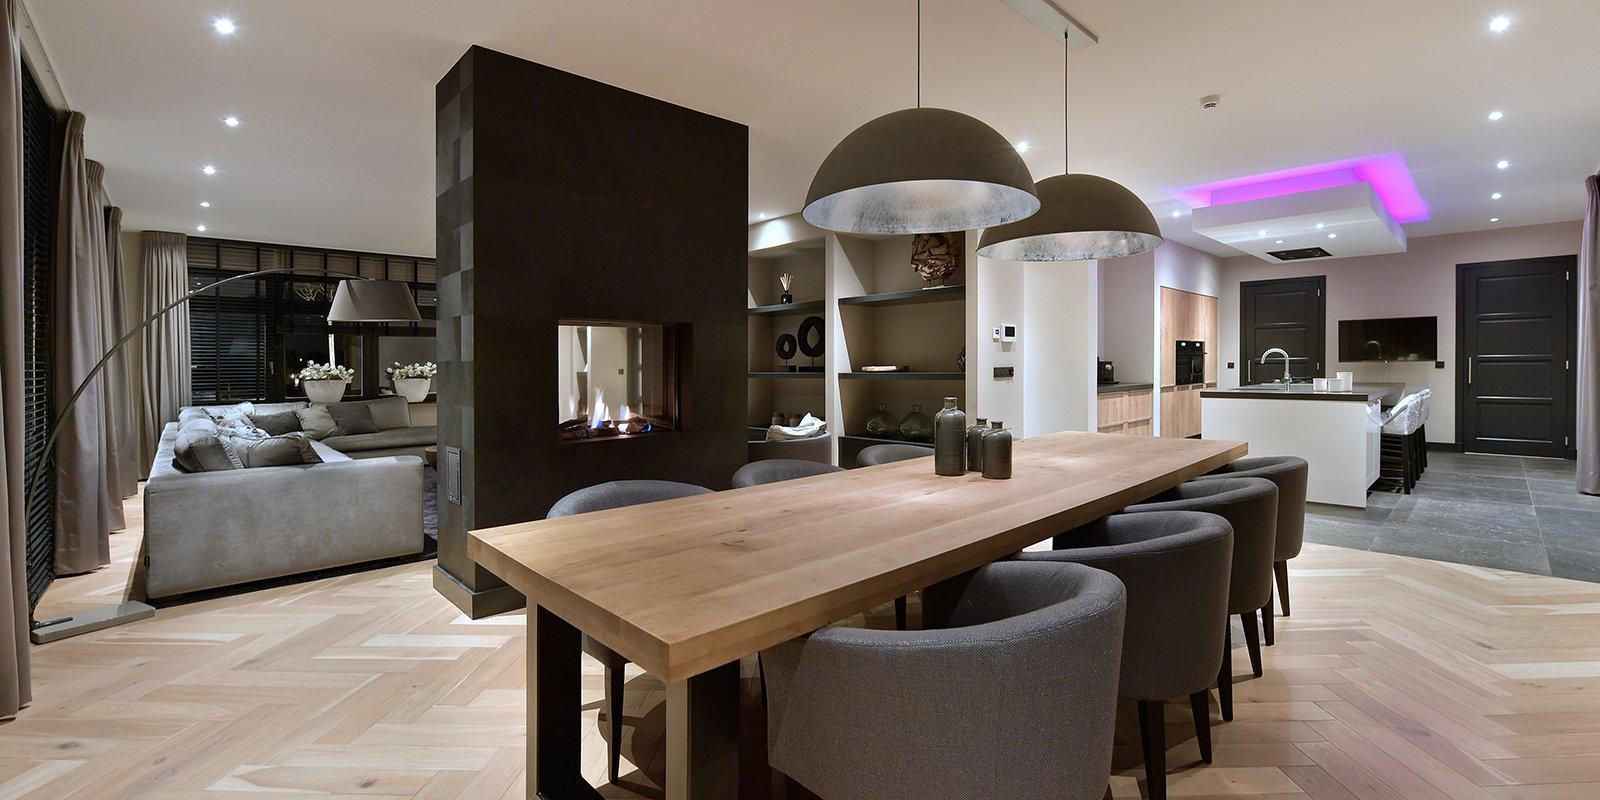 Open keuken, Thomas de Gier, Keuken inspiratie, Keuken, Eetkamer